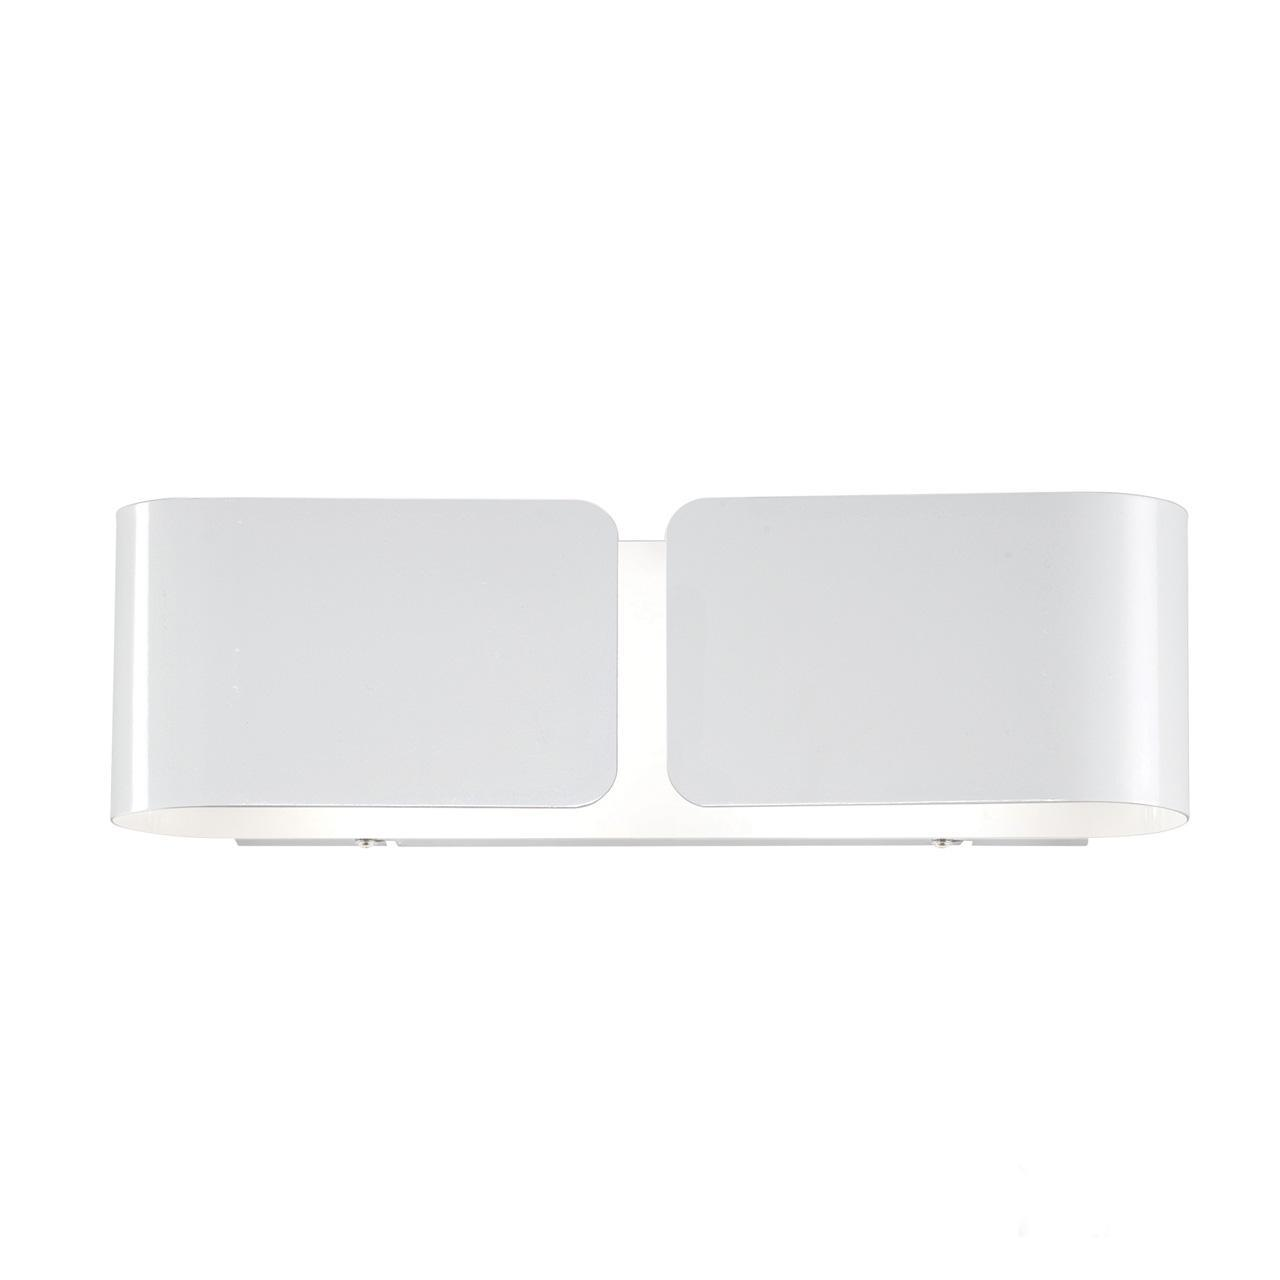 Настенный светильник Ideal Lux Clip AP2 Small Bianco цена